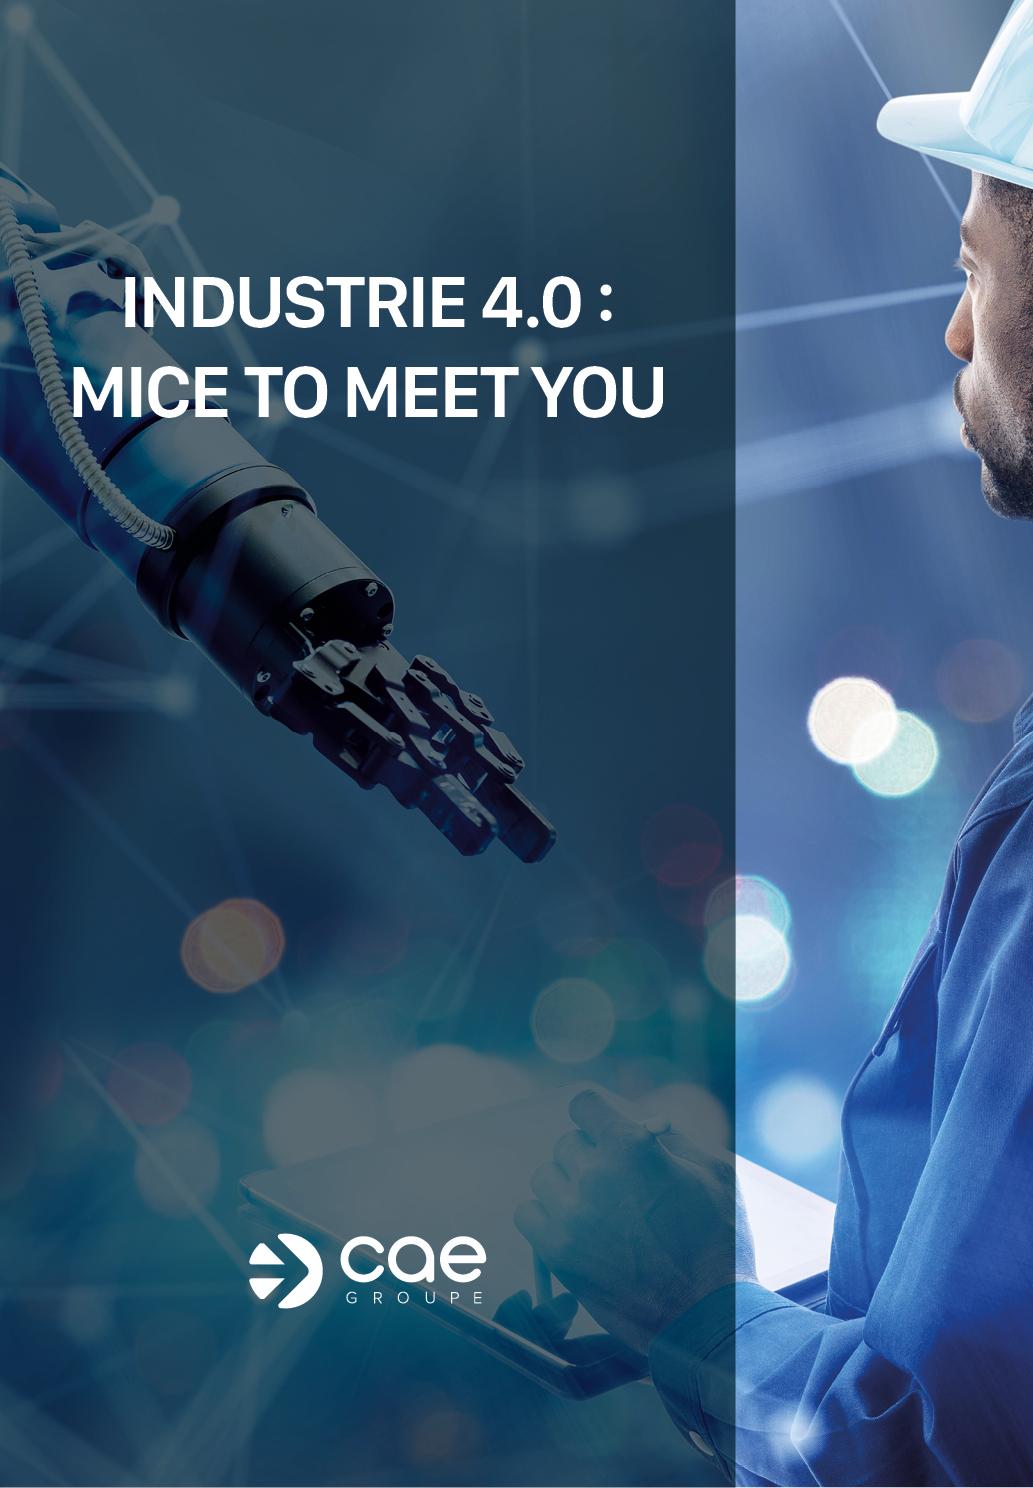 Industrie 4.0 - MICE